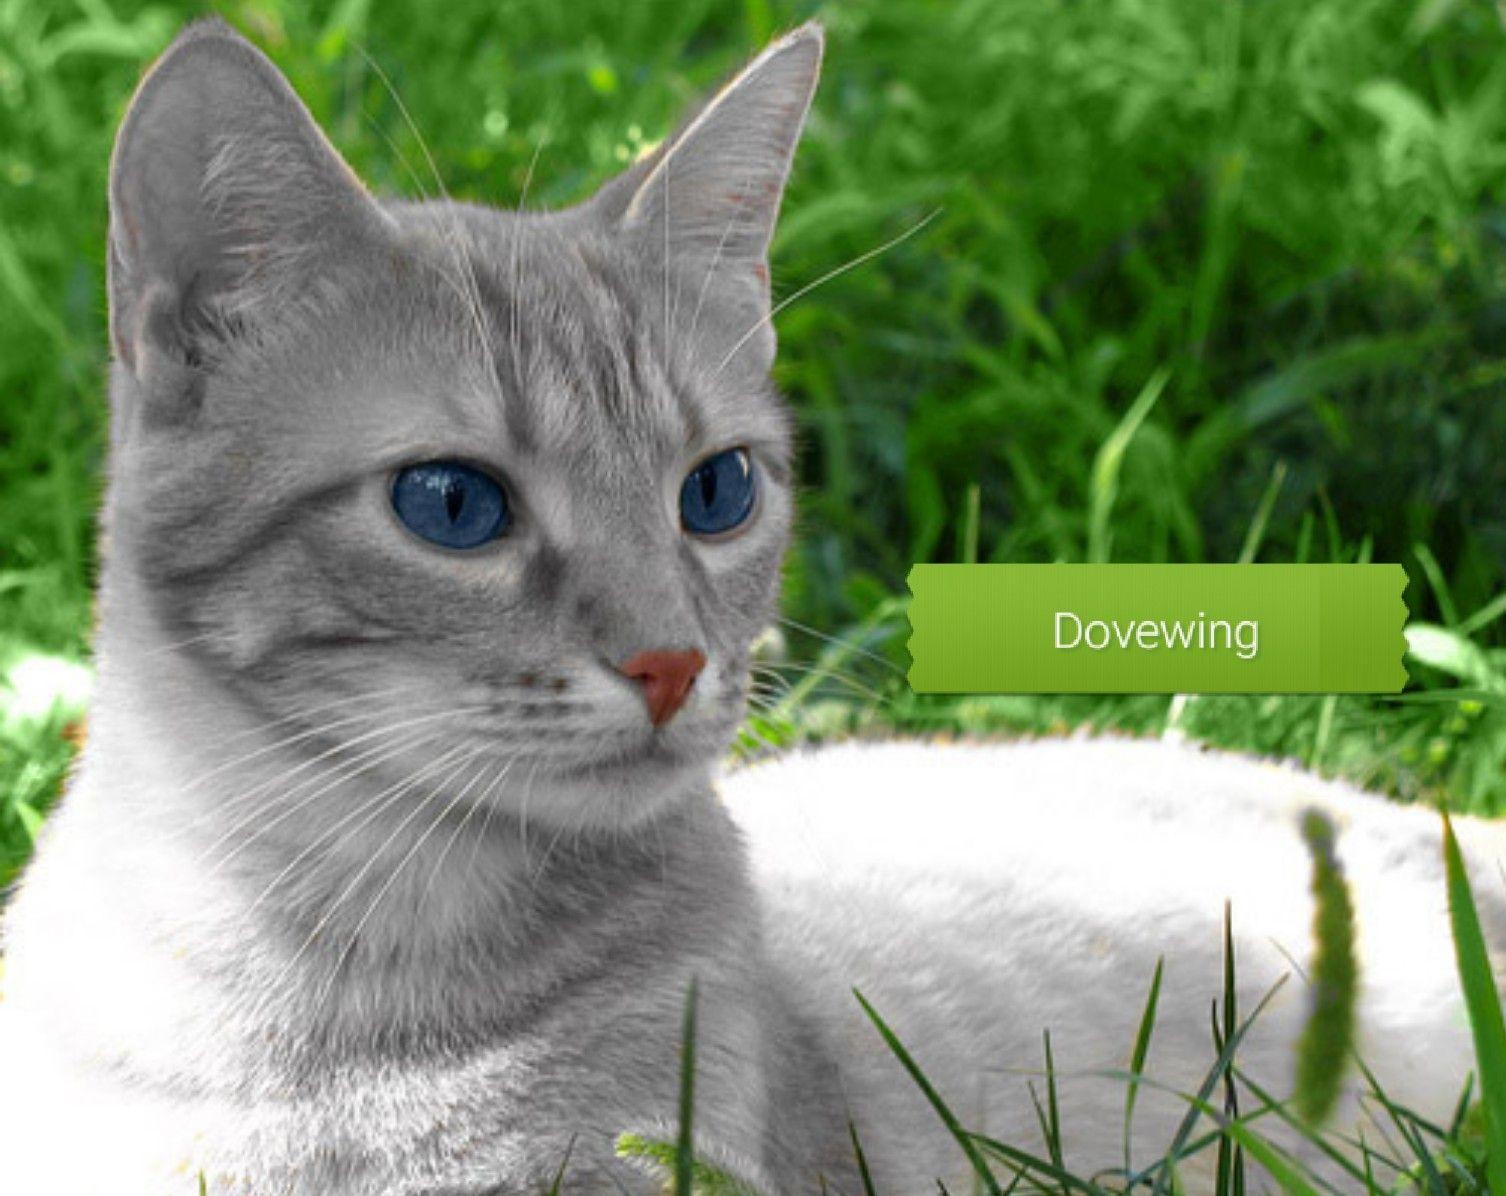 Dovewing Tabby Cat Grey Tabby Cats Silver Tabby Cat